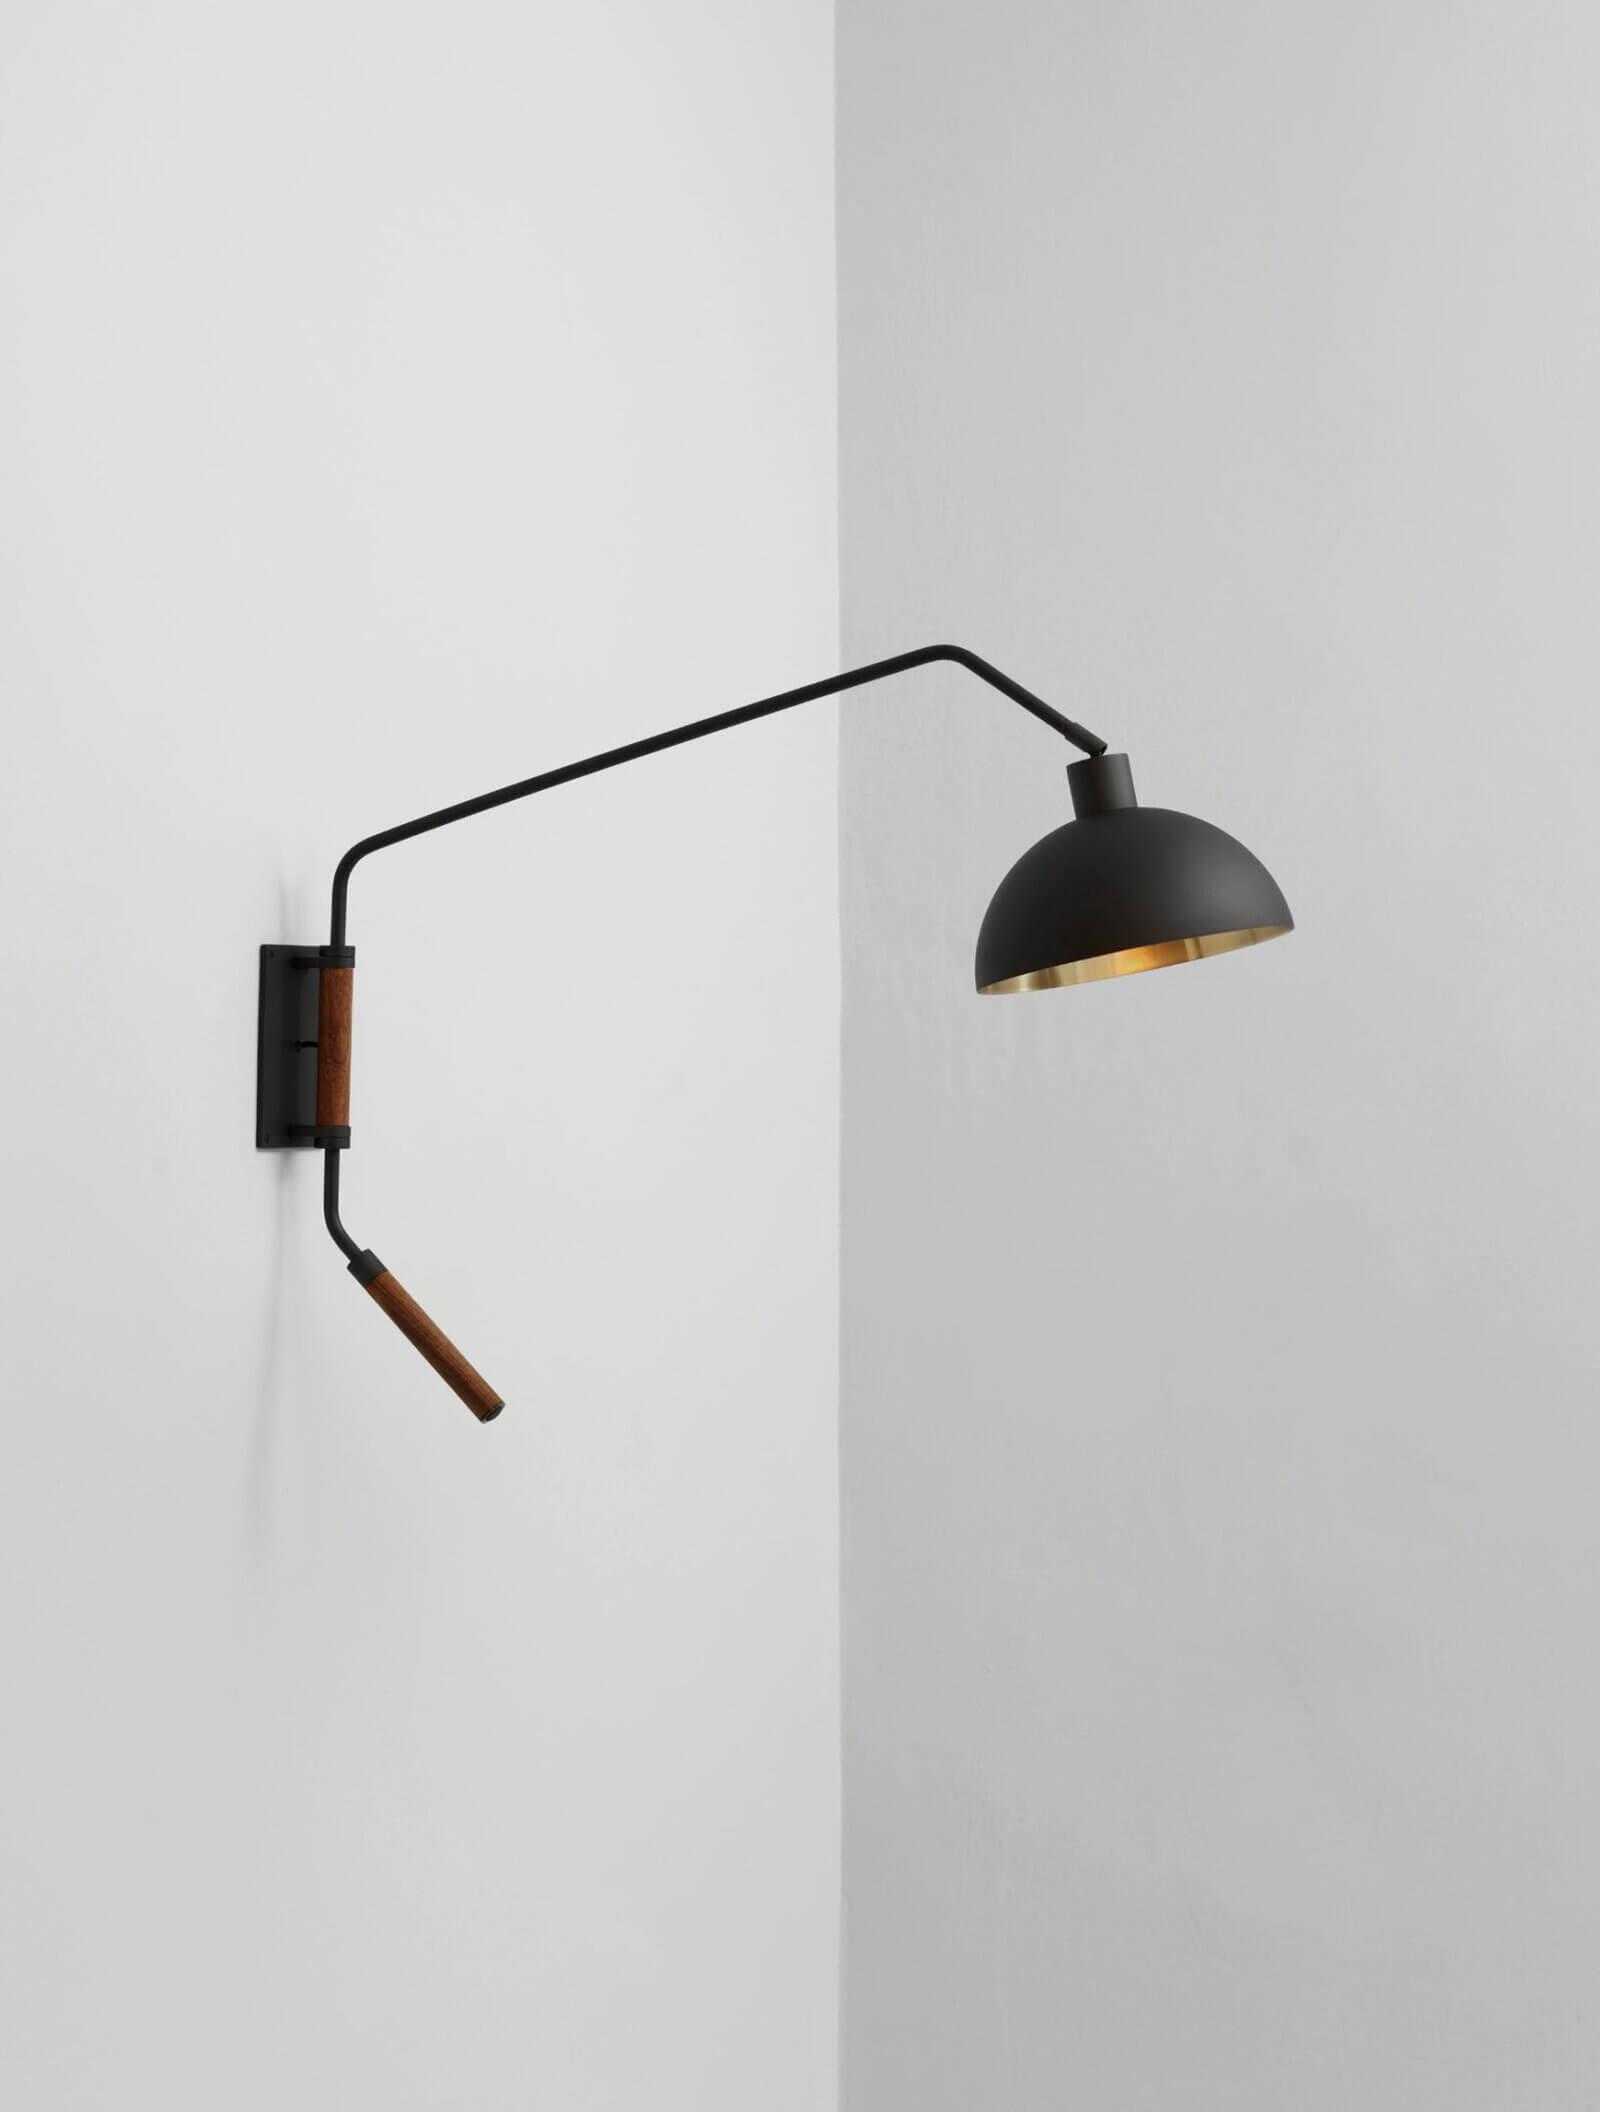 TinnappelMetz-allied-maker-arc-wall-lamp-01